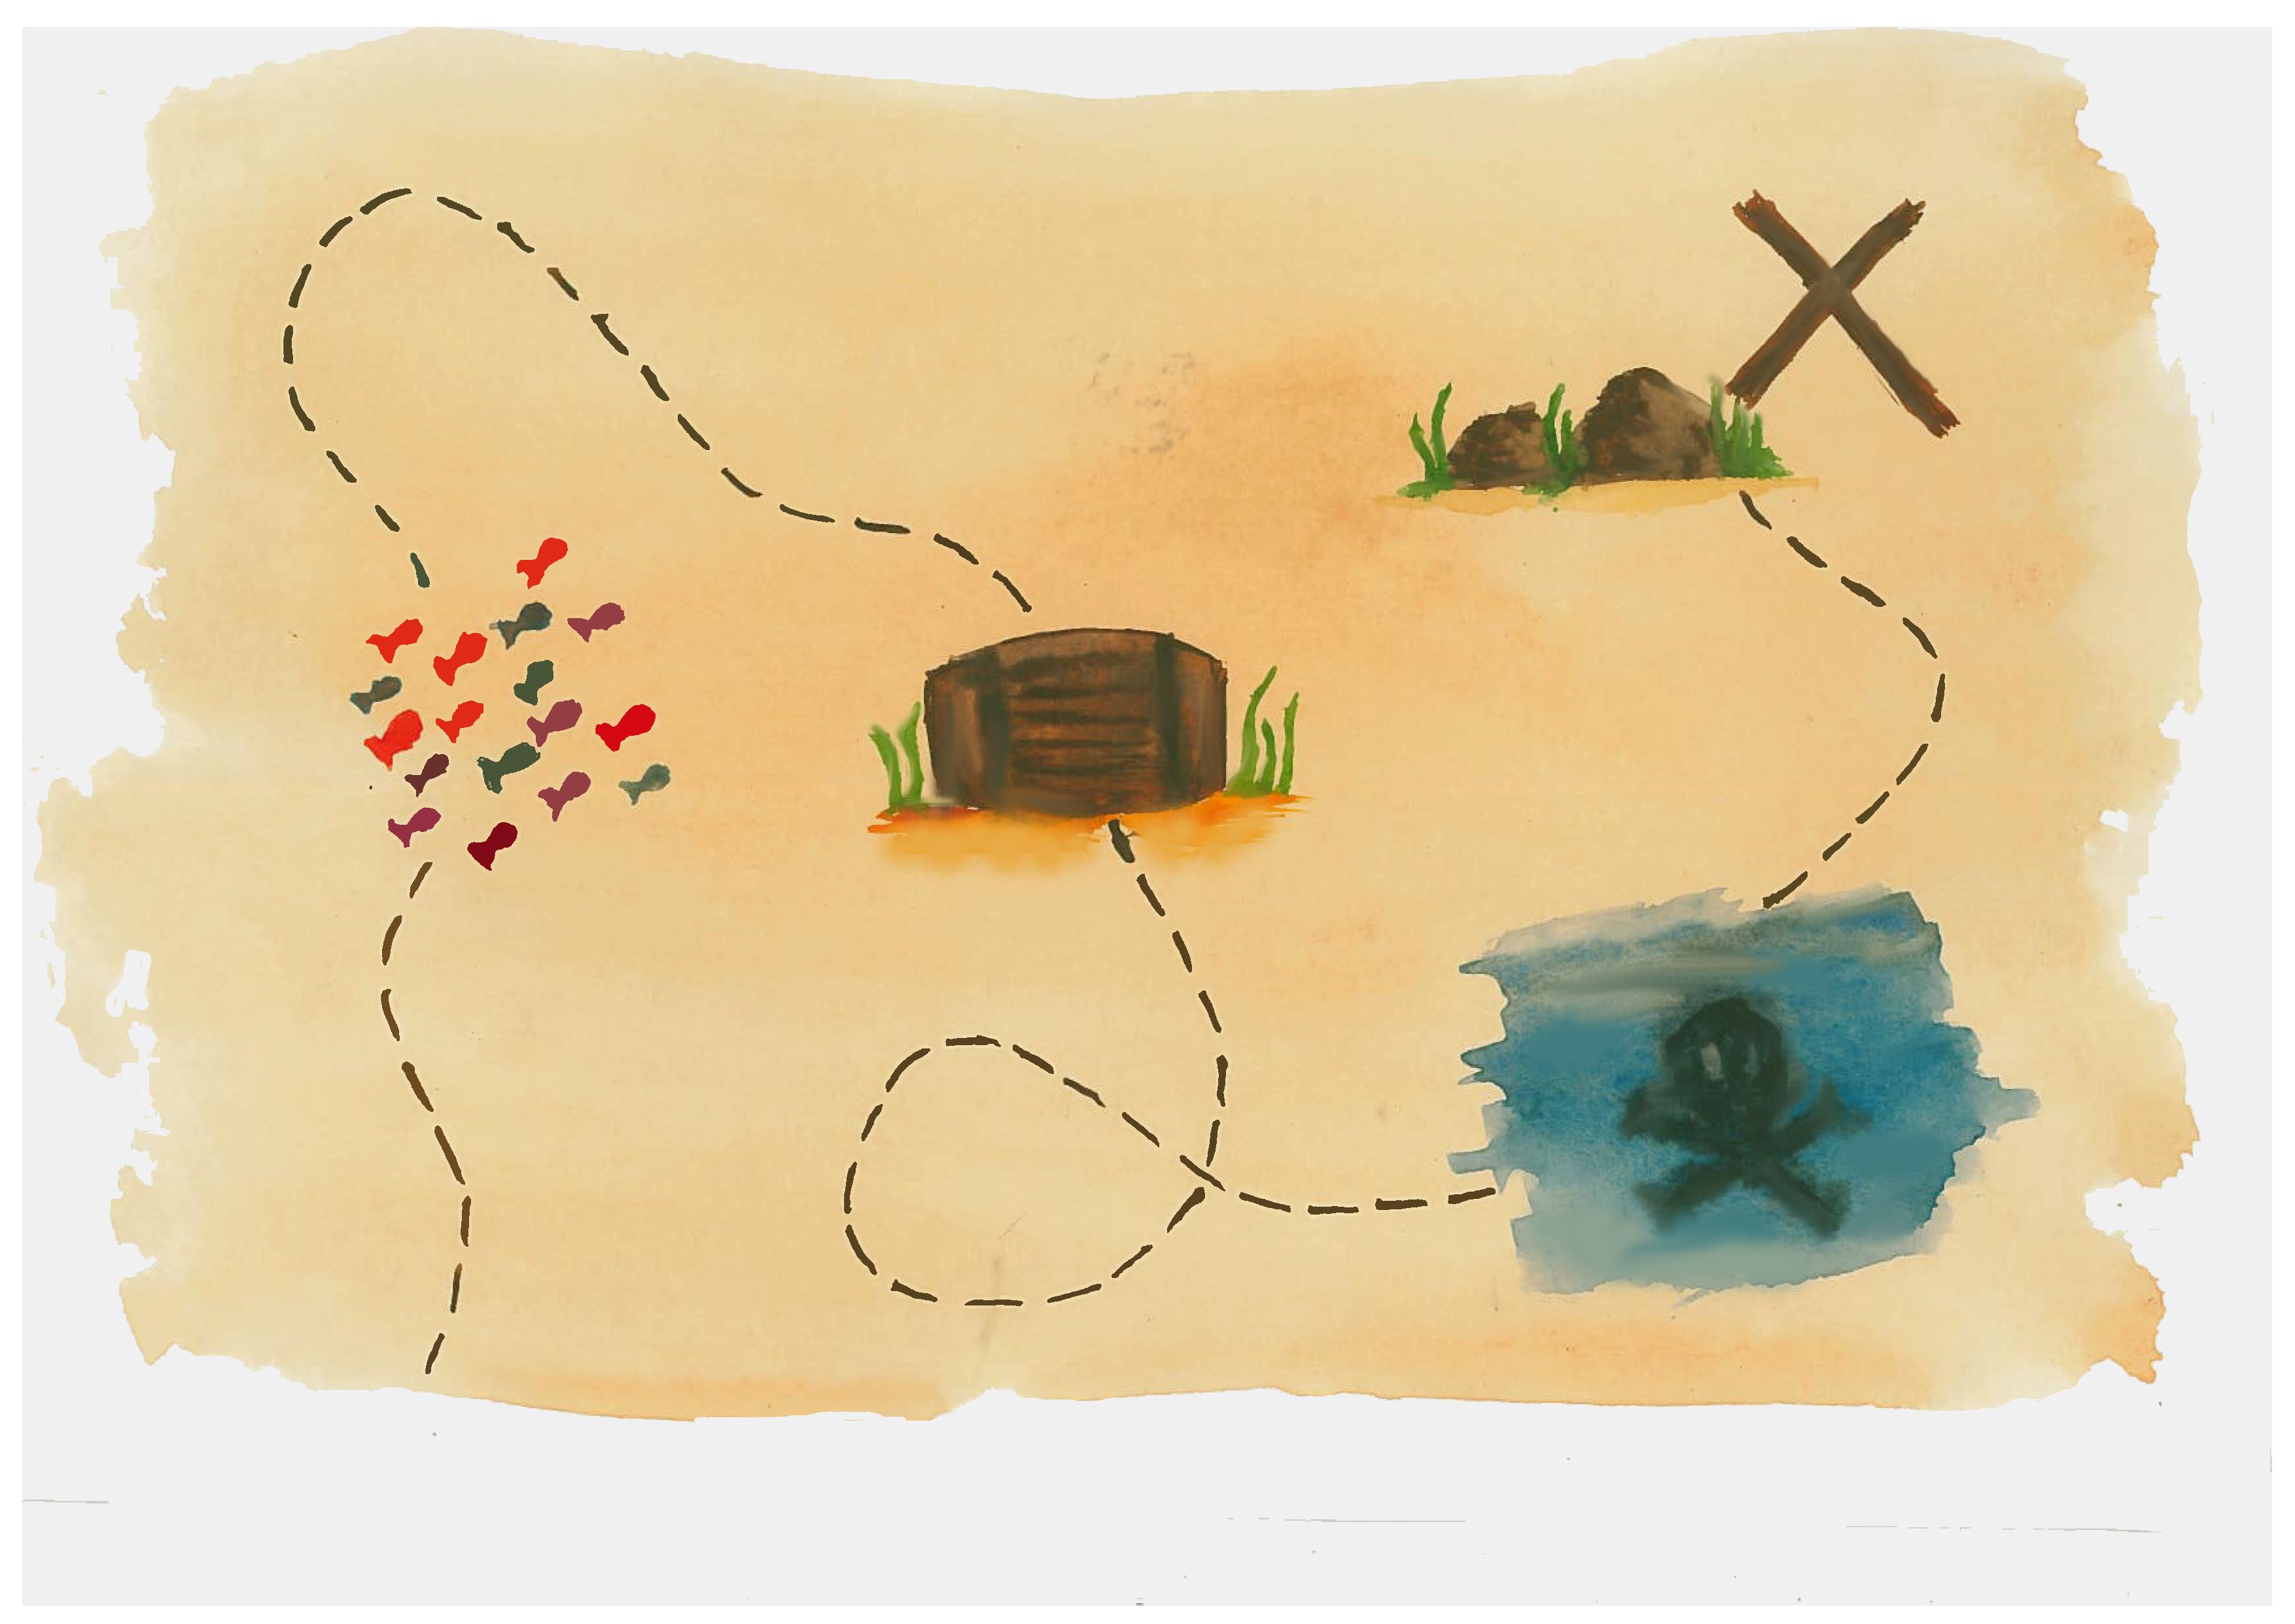 Of world picture animated. Treasure clipart treasure map